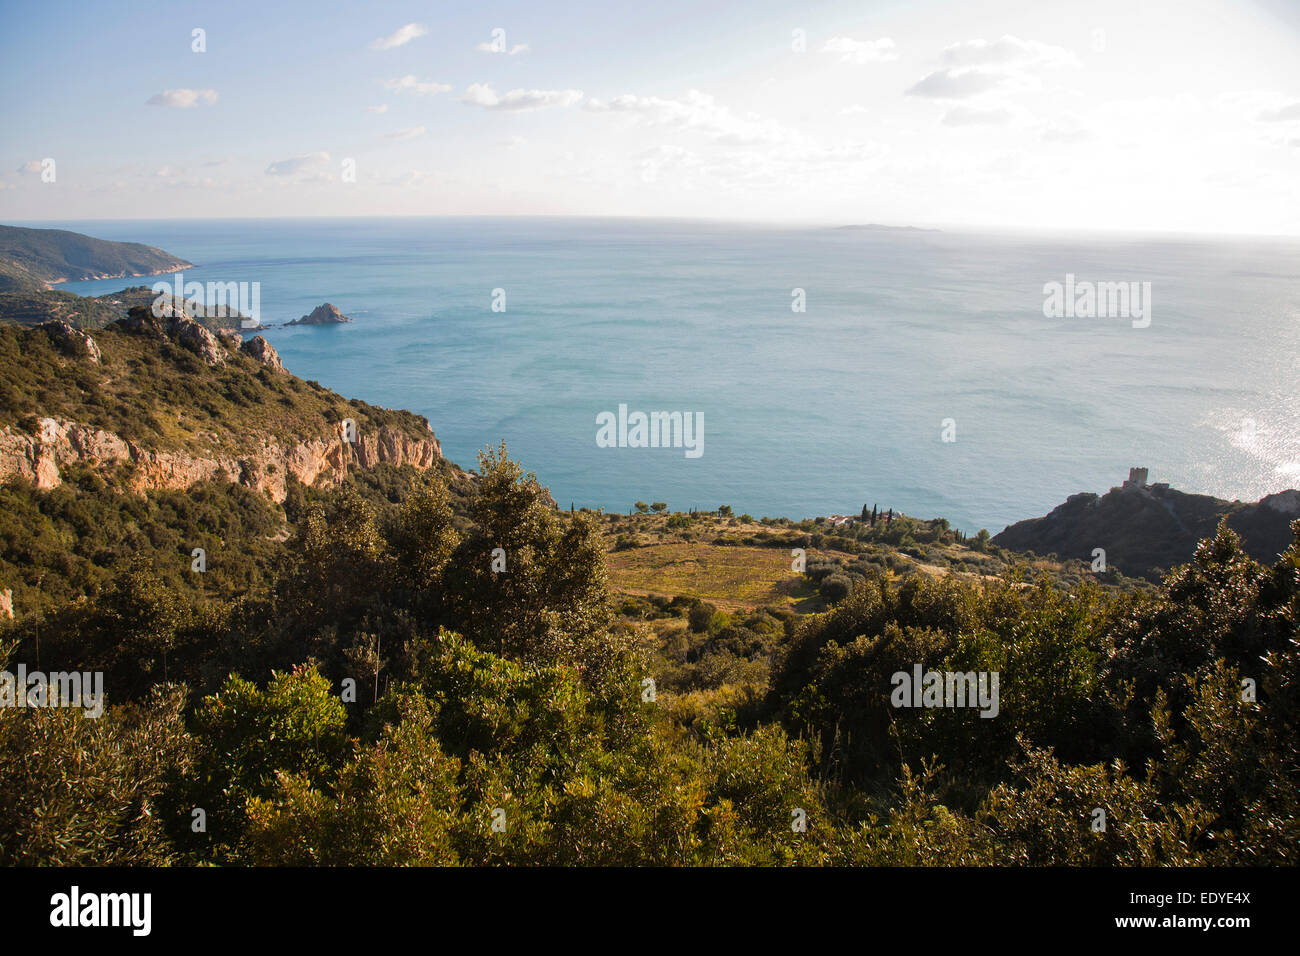 panorama with giannutri island, argentario, tuscany, italy, europe - Stock Image